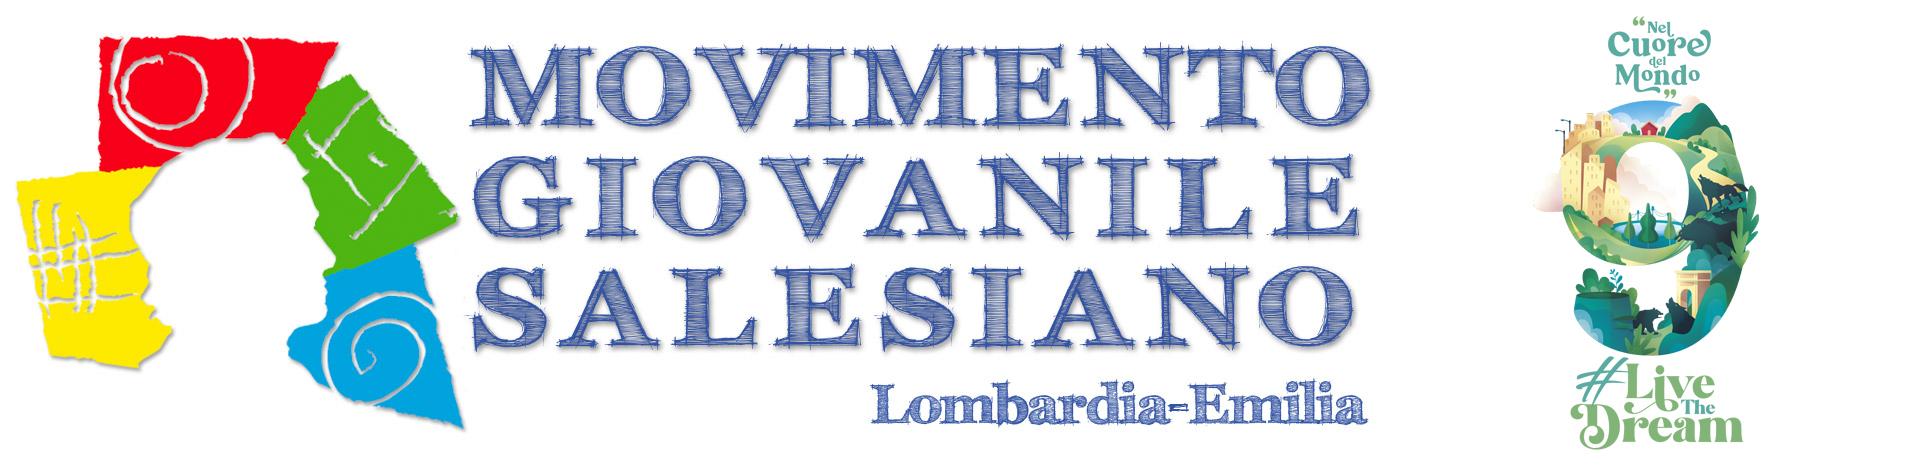 Movimento Giovanile Salesiano – Lombardia-Emilia Logo